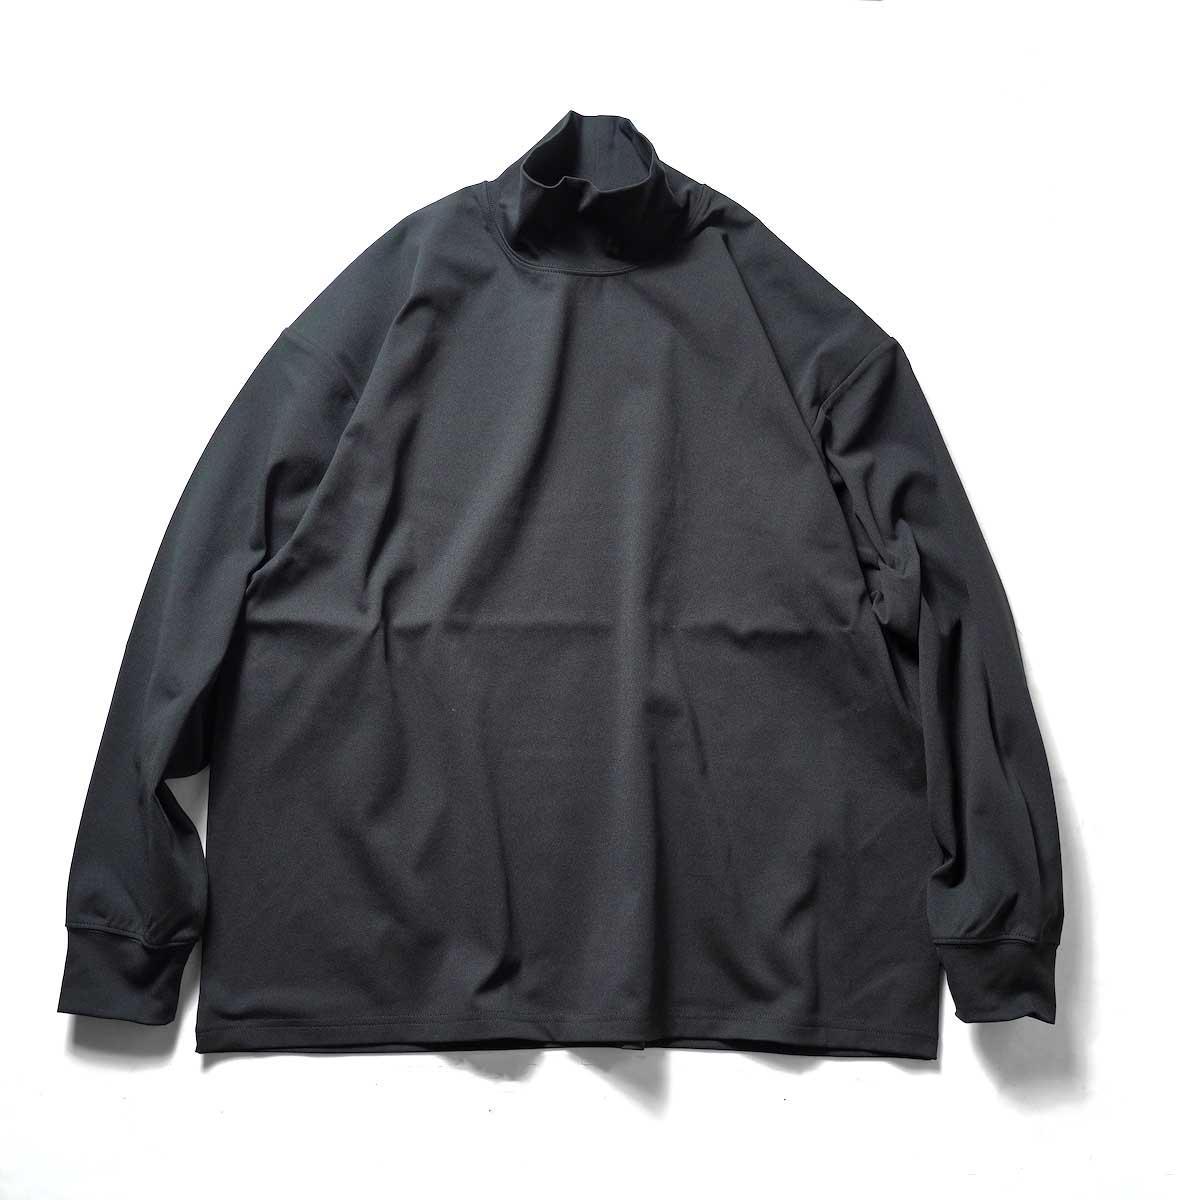 DAIWA PIER39 / TECH MOCK NECK TEE L/S (Black)